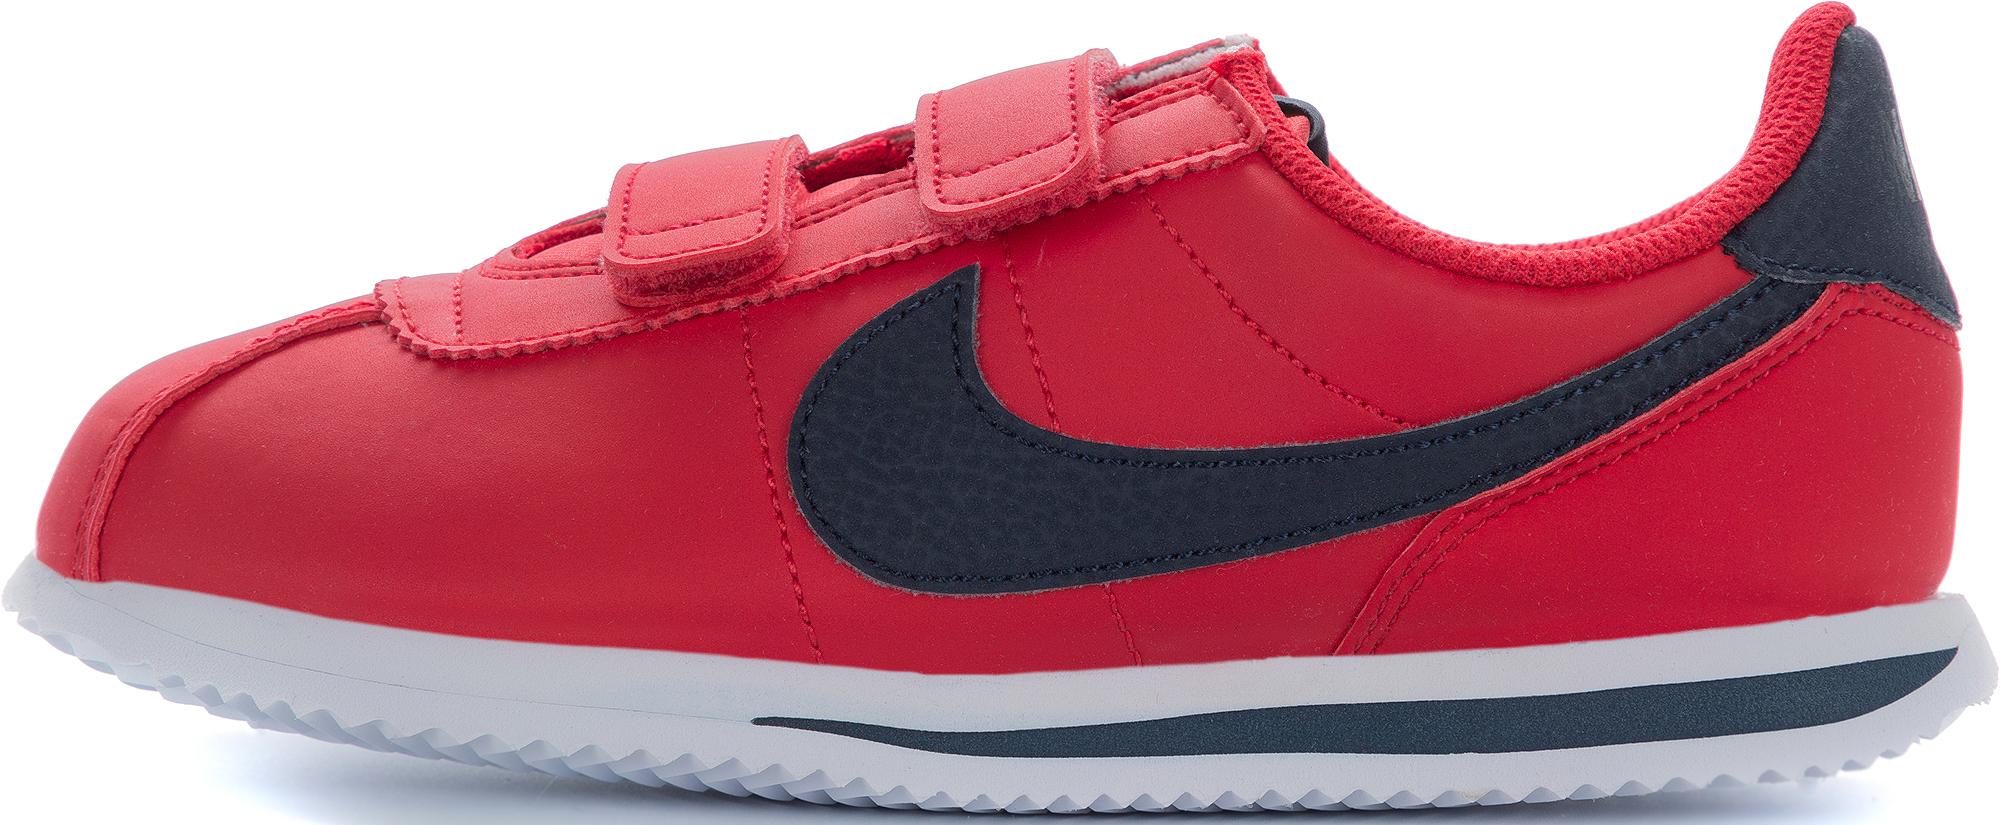 Nike Кроссовки детские Nike Cortez Basic SL, размер 33